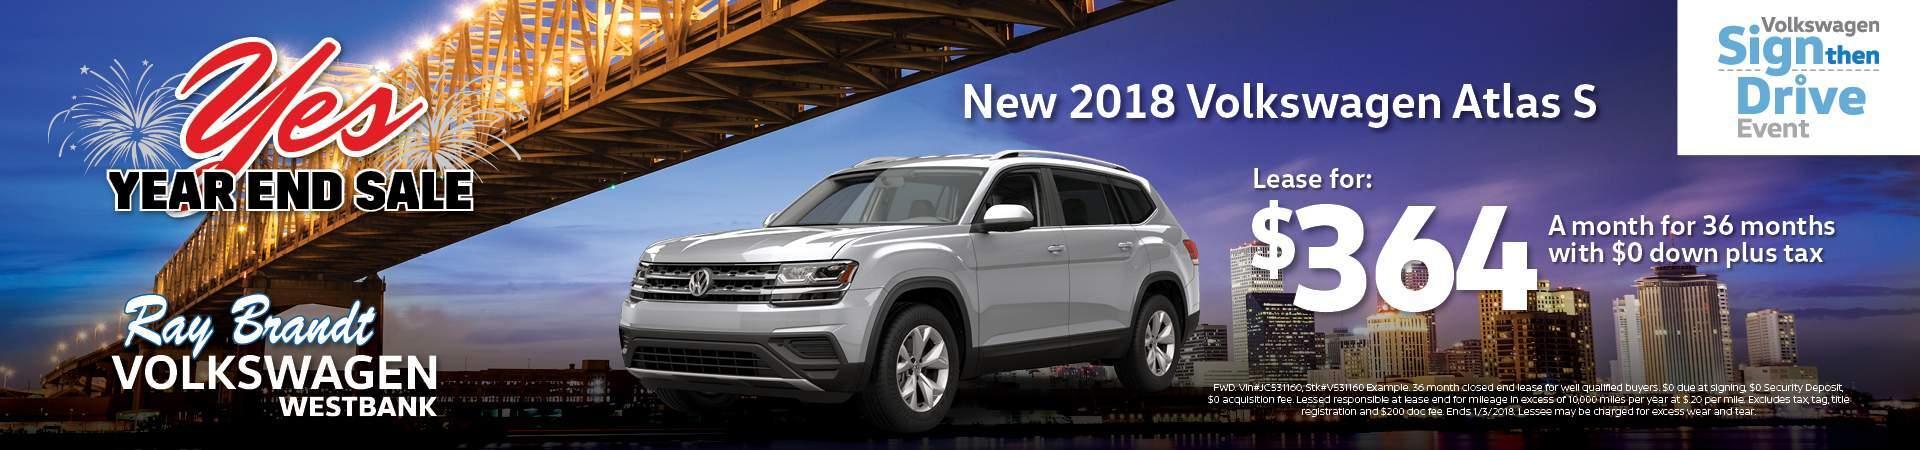 Volkswagen Dealership New Orleans, VW Dealership Louisiana, Volkswagen Service, Used Car ...